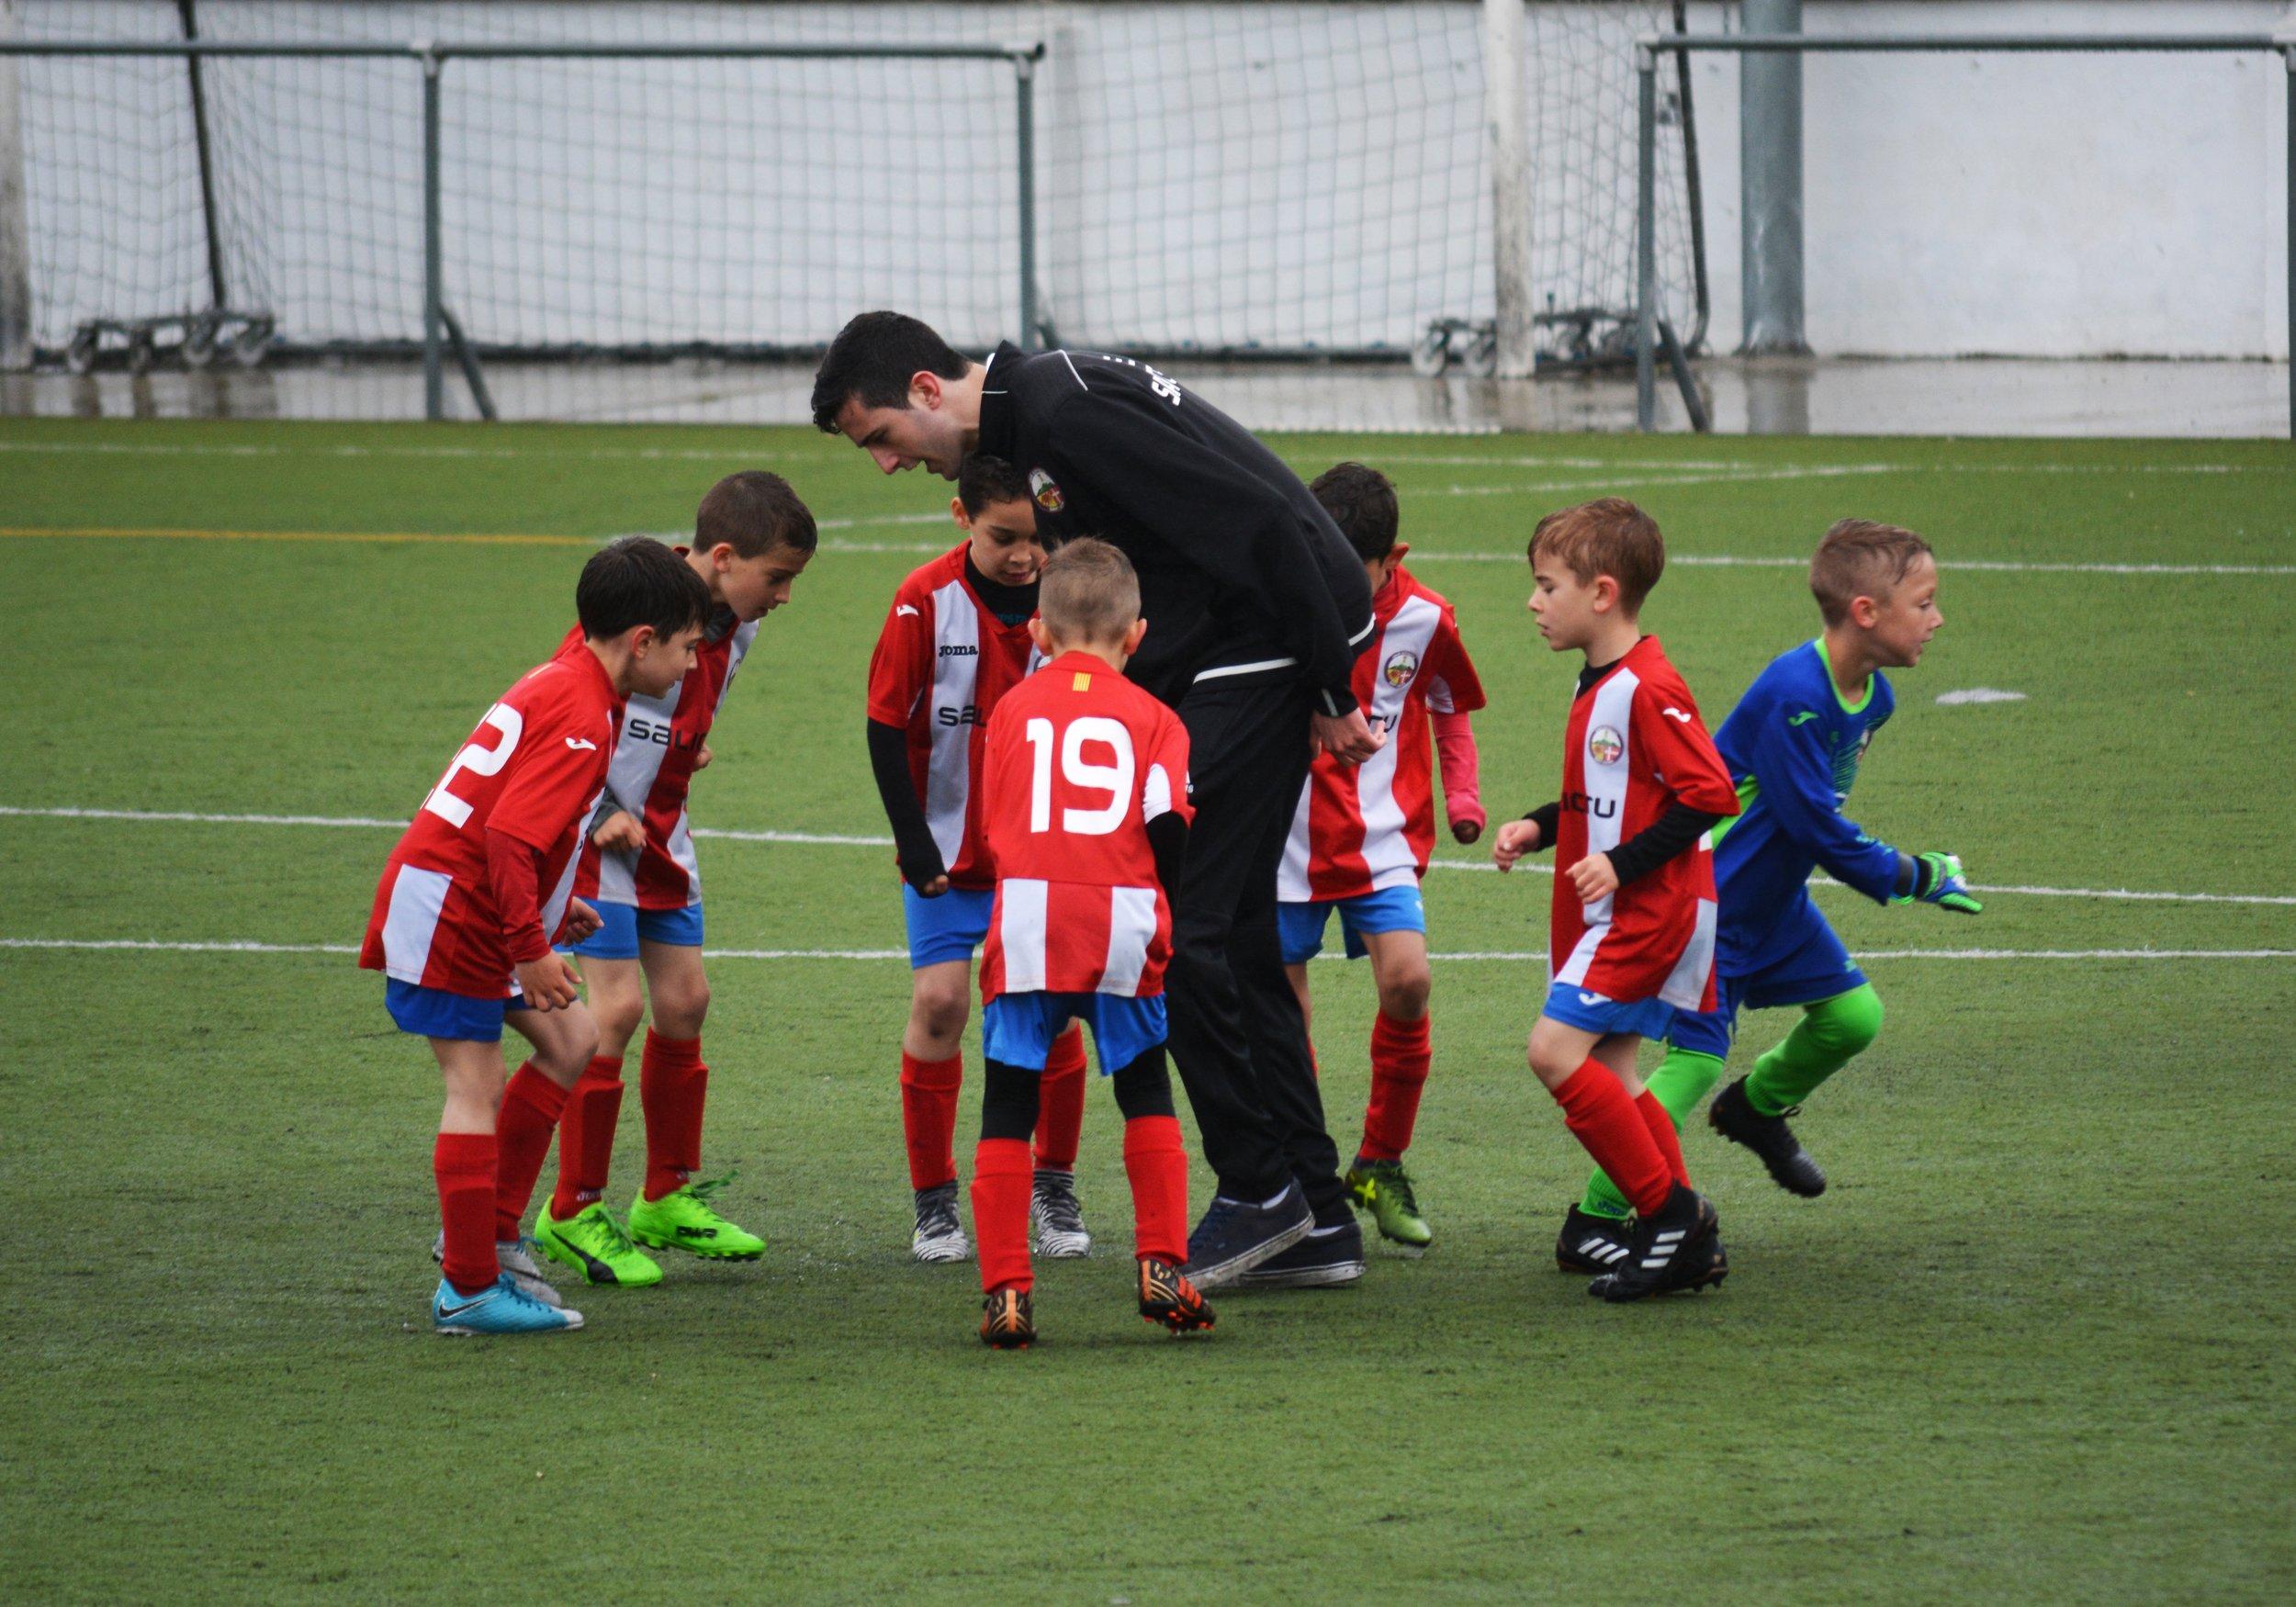 Primary school sports coach